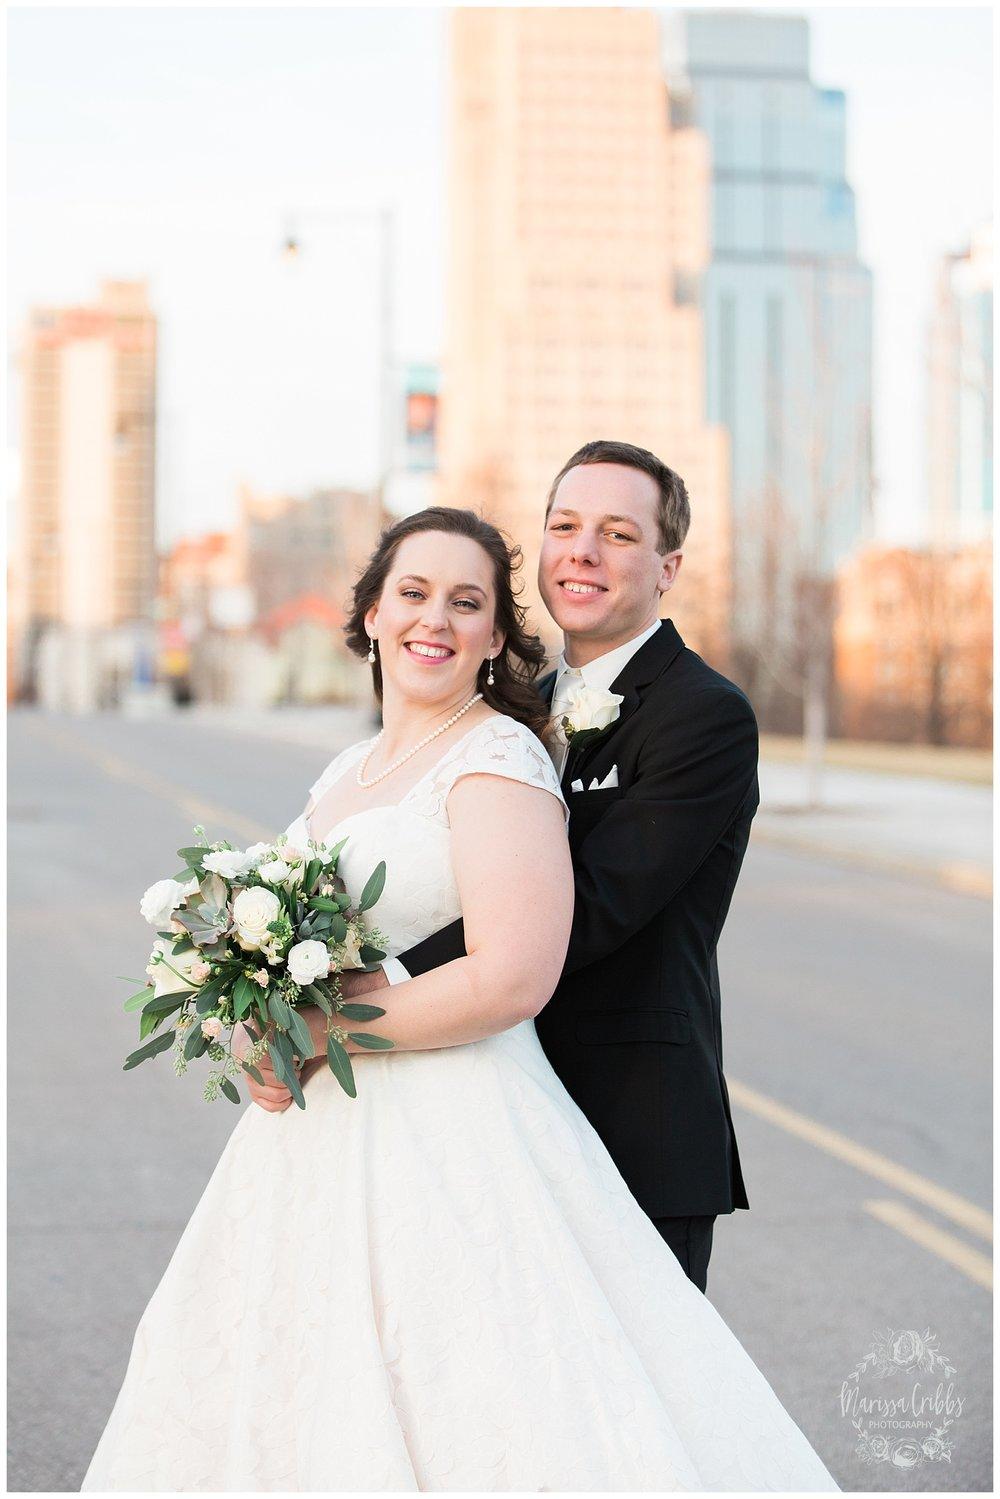 Webster House KC Wedding | KC Wedding Photographer | Marissa Cribbs Photography_0074.jpg